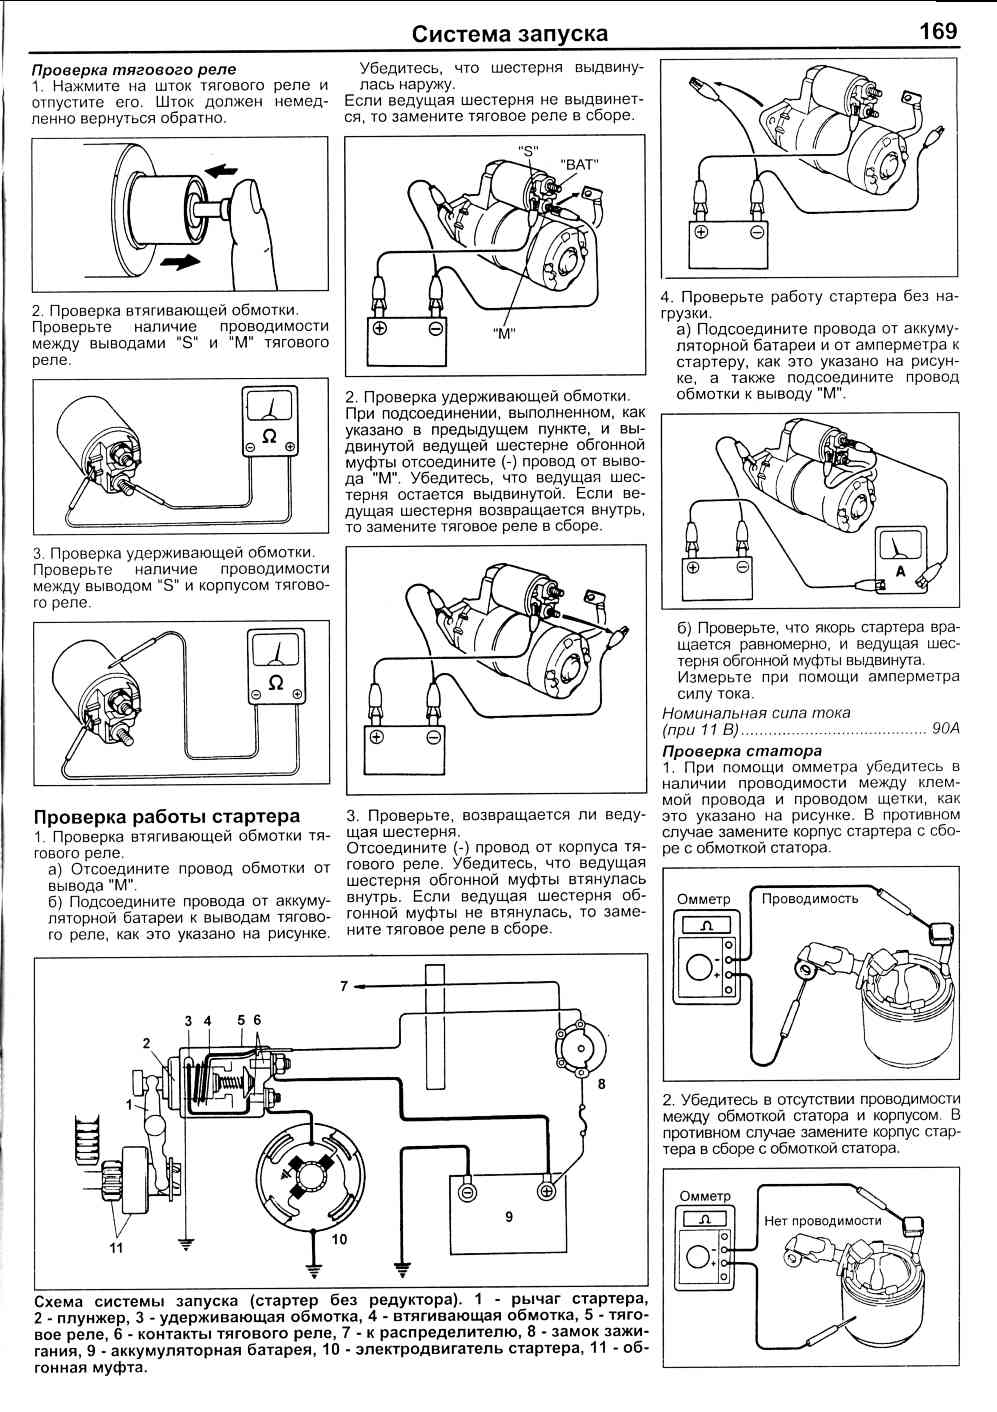 Фото №16 - как проверить стартер ВАЗ 2110